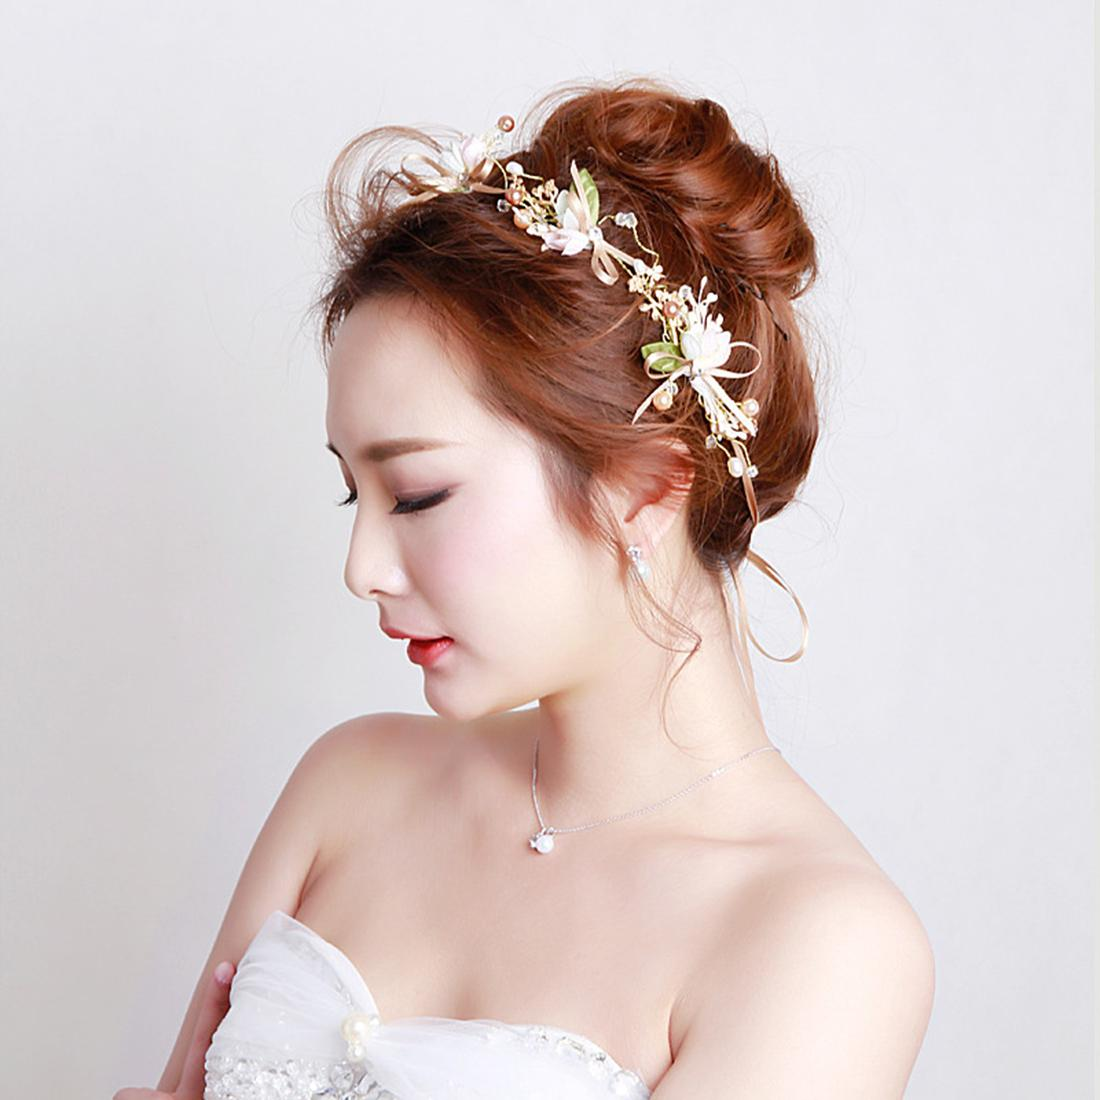 US Warehouse Bridal Headband Headpiece with Rhinestone and Imitation Pearl Crown Hair Wreath Halo with Adjustable Ribbon for Wedding Gift